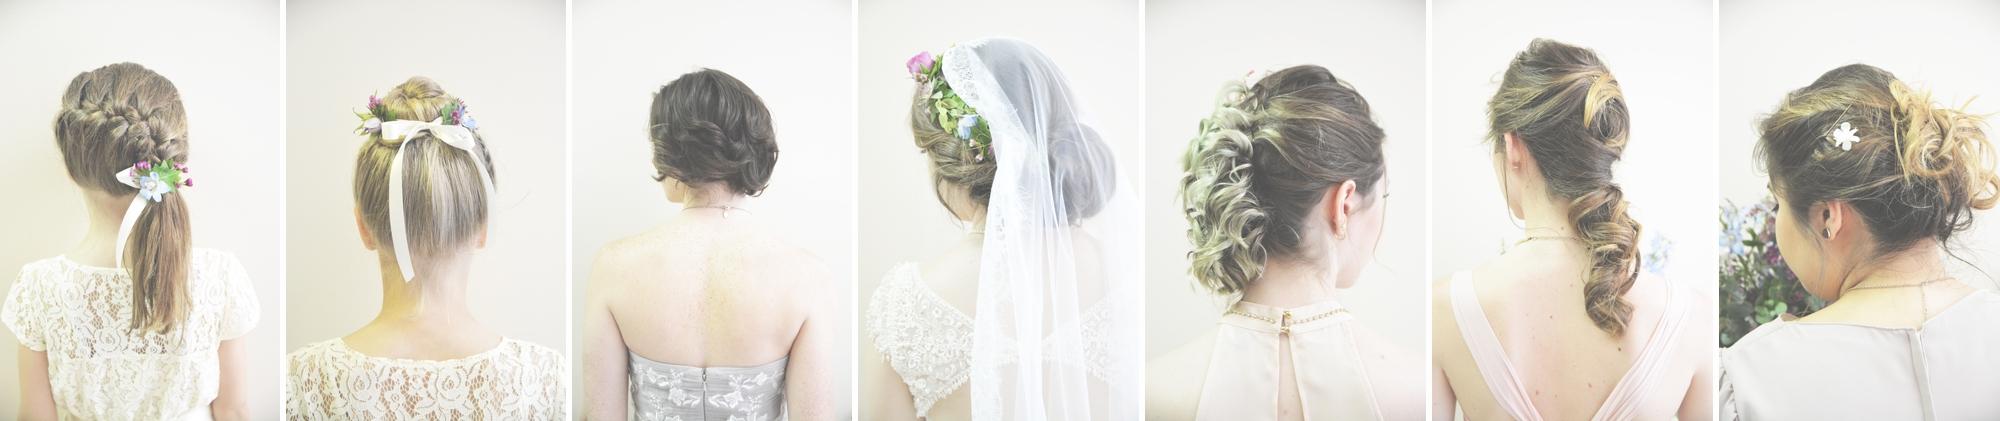 cheek creek wedding photography - Six Hearts Photography012